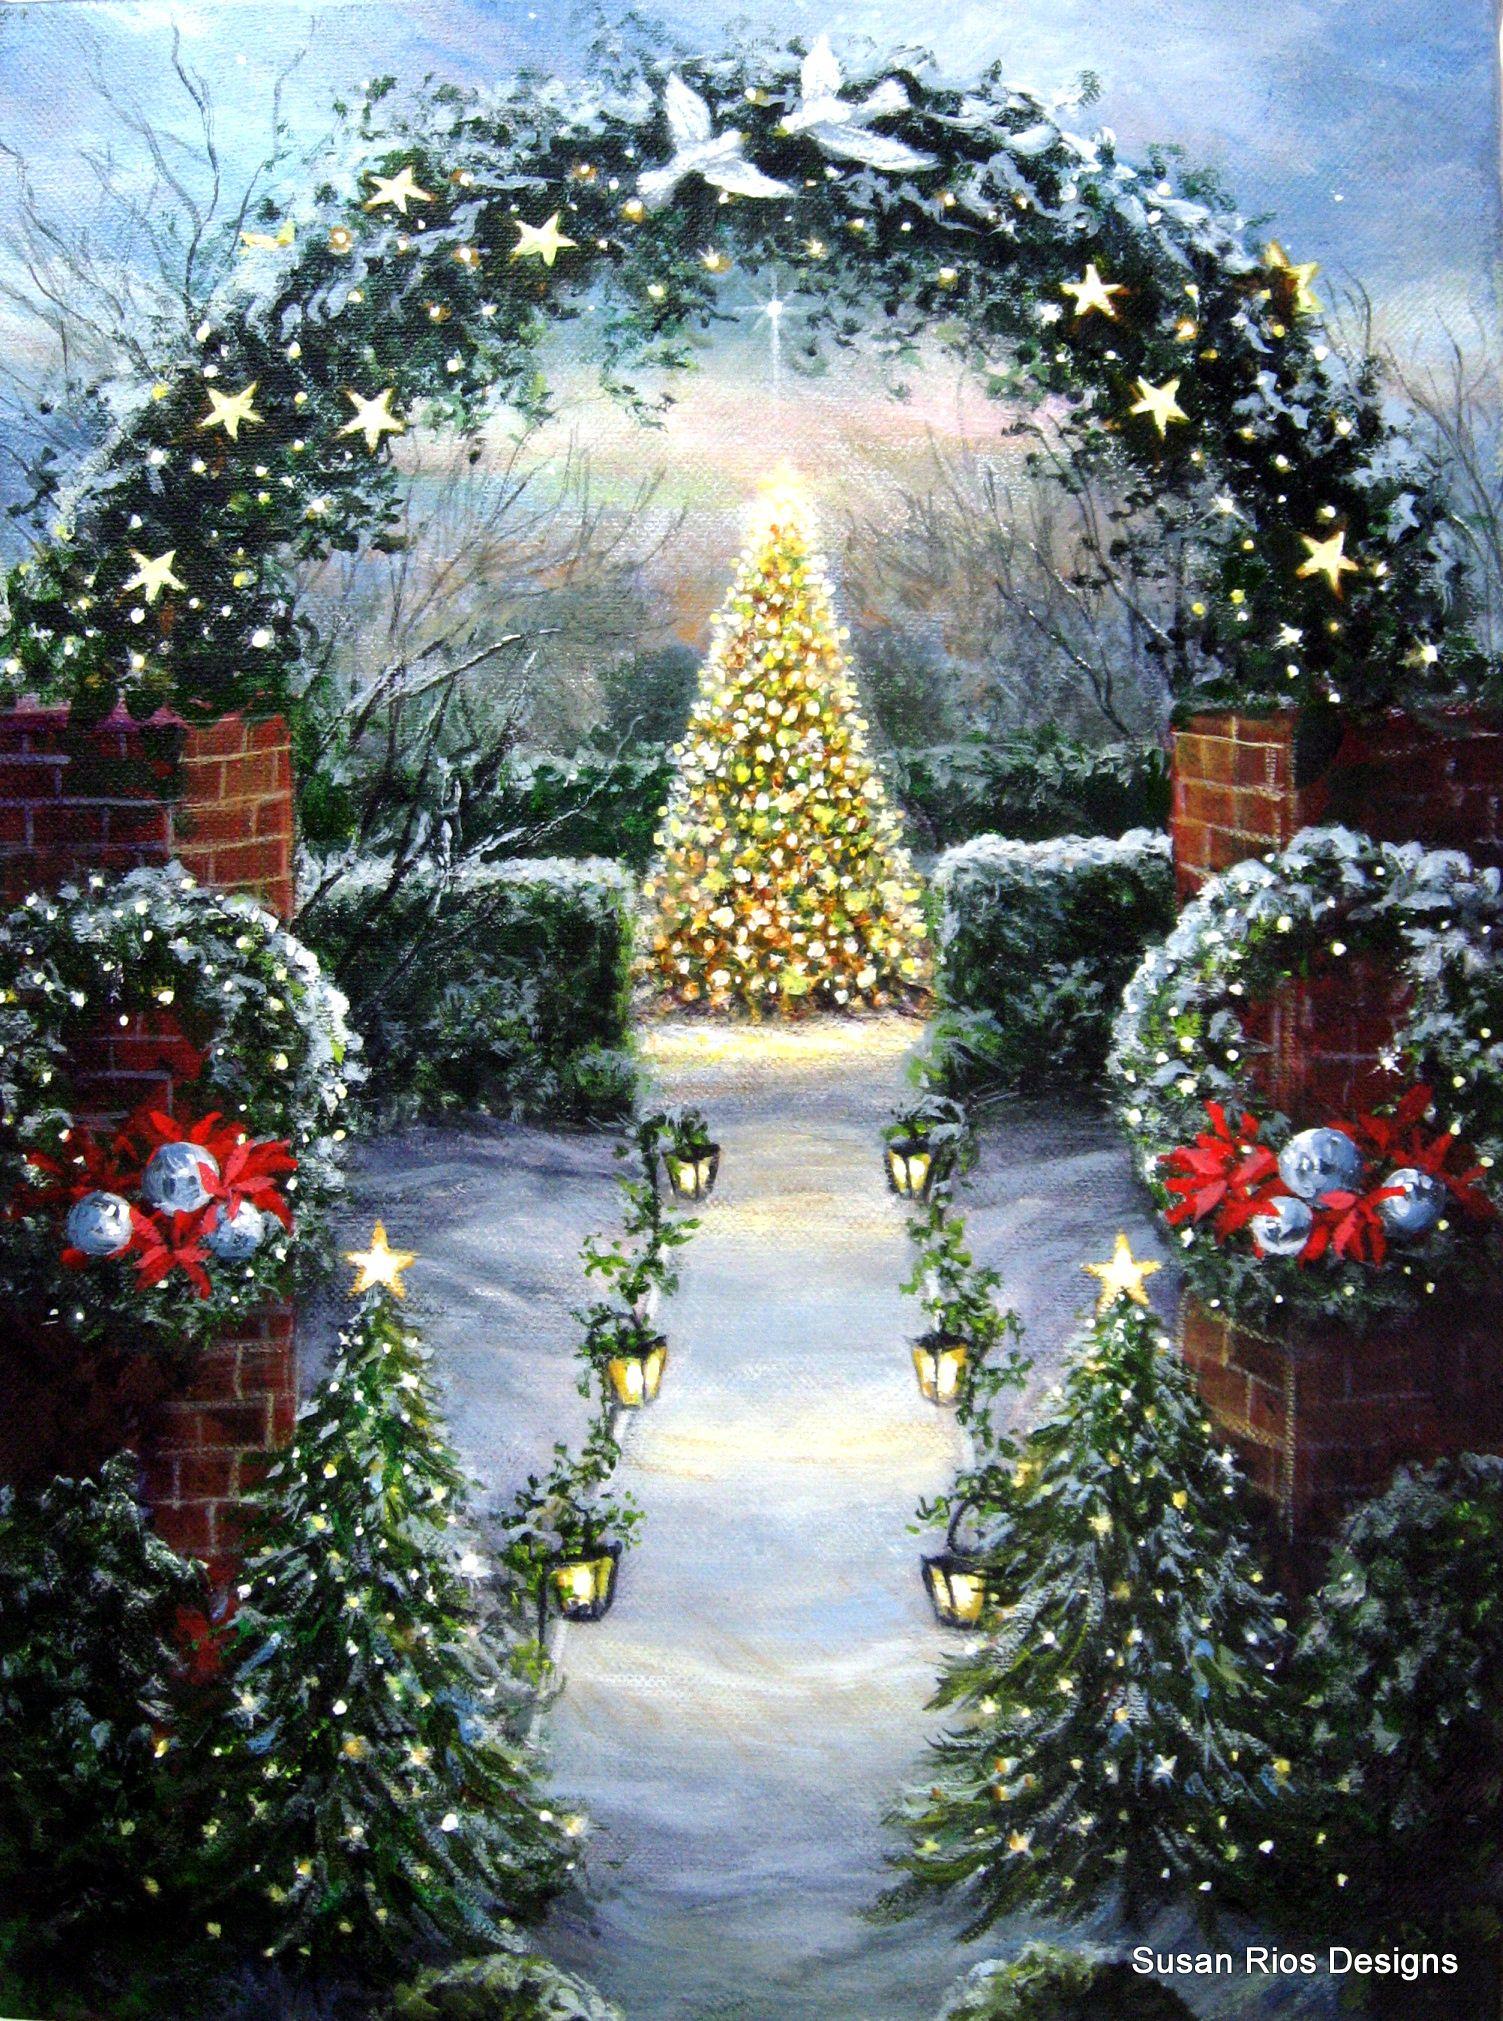 Thomas kinkade o holy night christmas stocking - 1000 Images About On Pinterest Vintage Christmas Cards Snowman And Christmas Cards